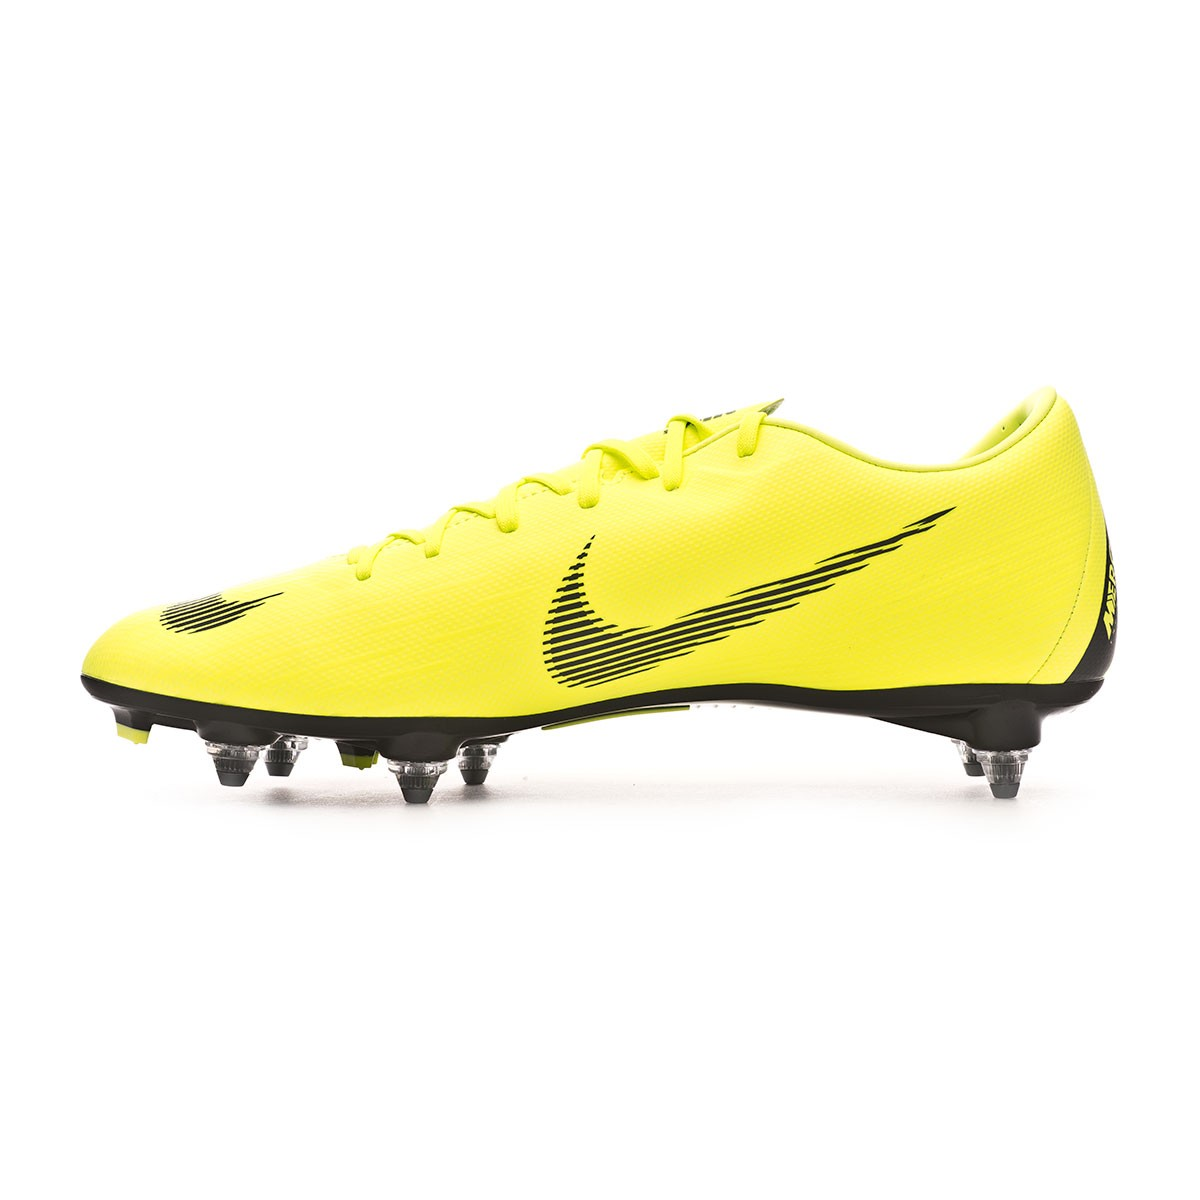 bd5e8066a44f Football Boots Nike Mercurial Vapor XII Academy SG-Pro Volt-Black - Tienda  de fútbol Fútbol Emotion